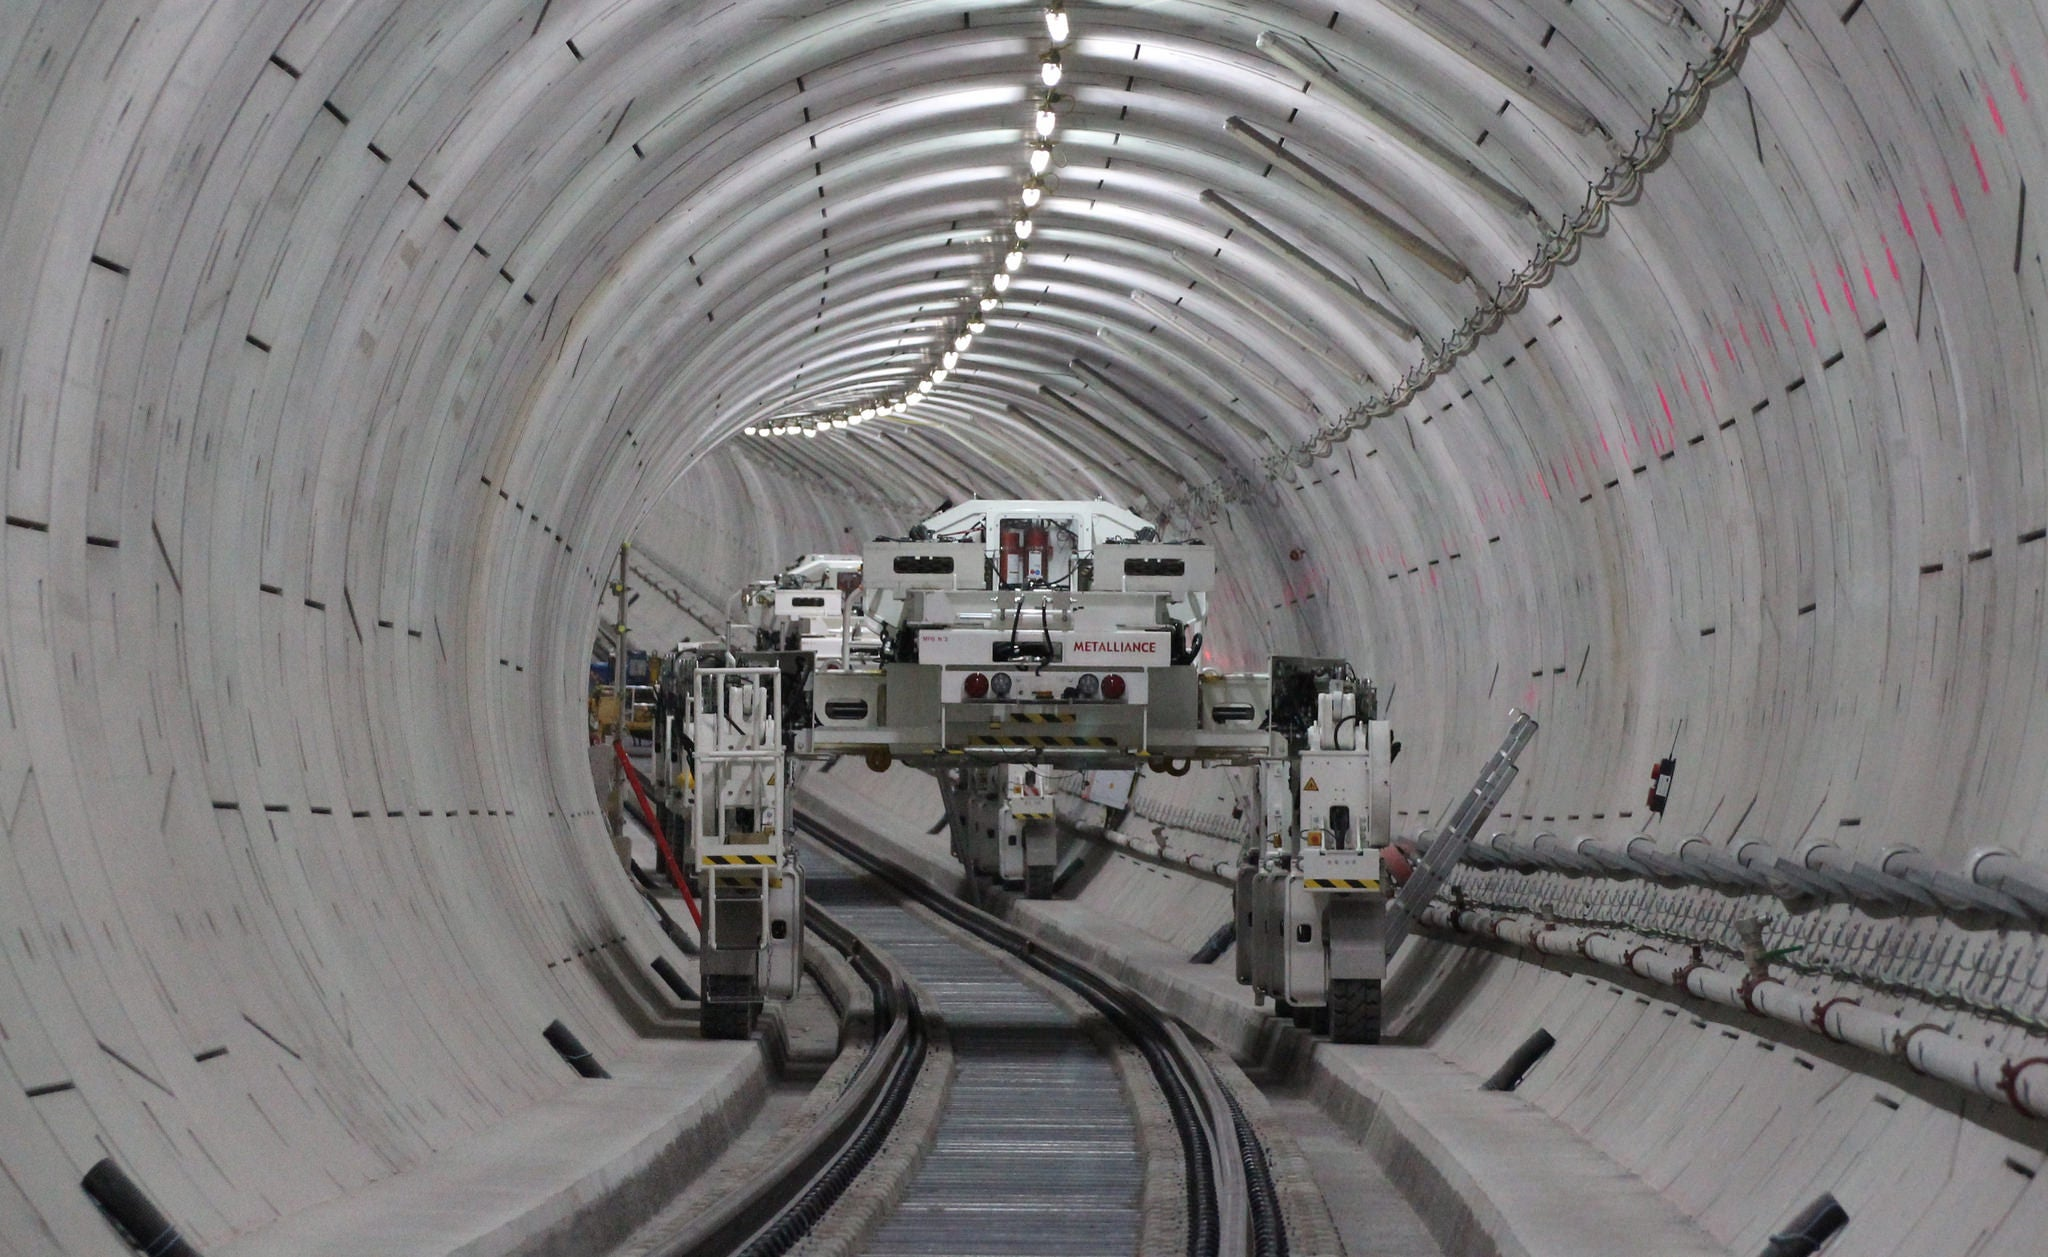 crossrail infrastructure london subway